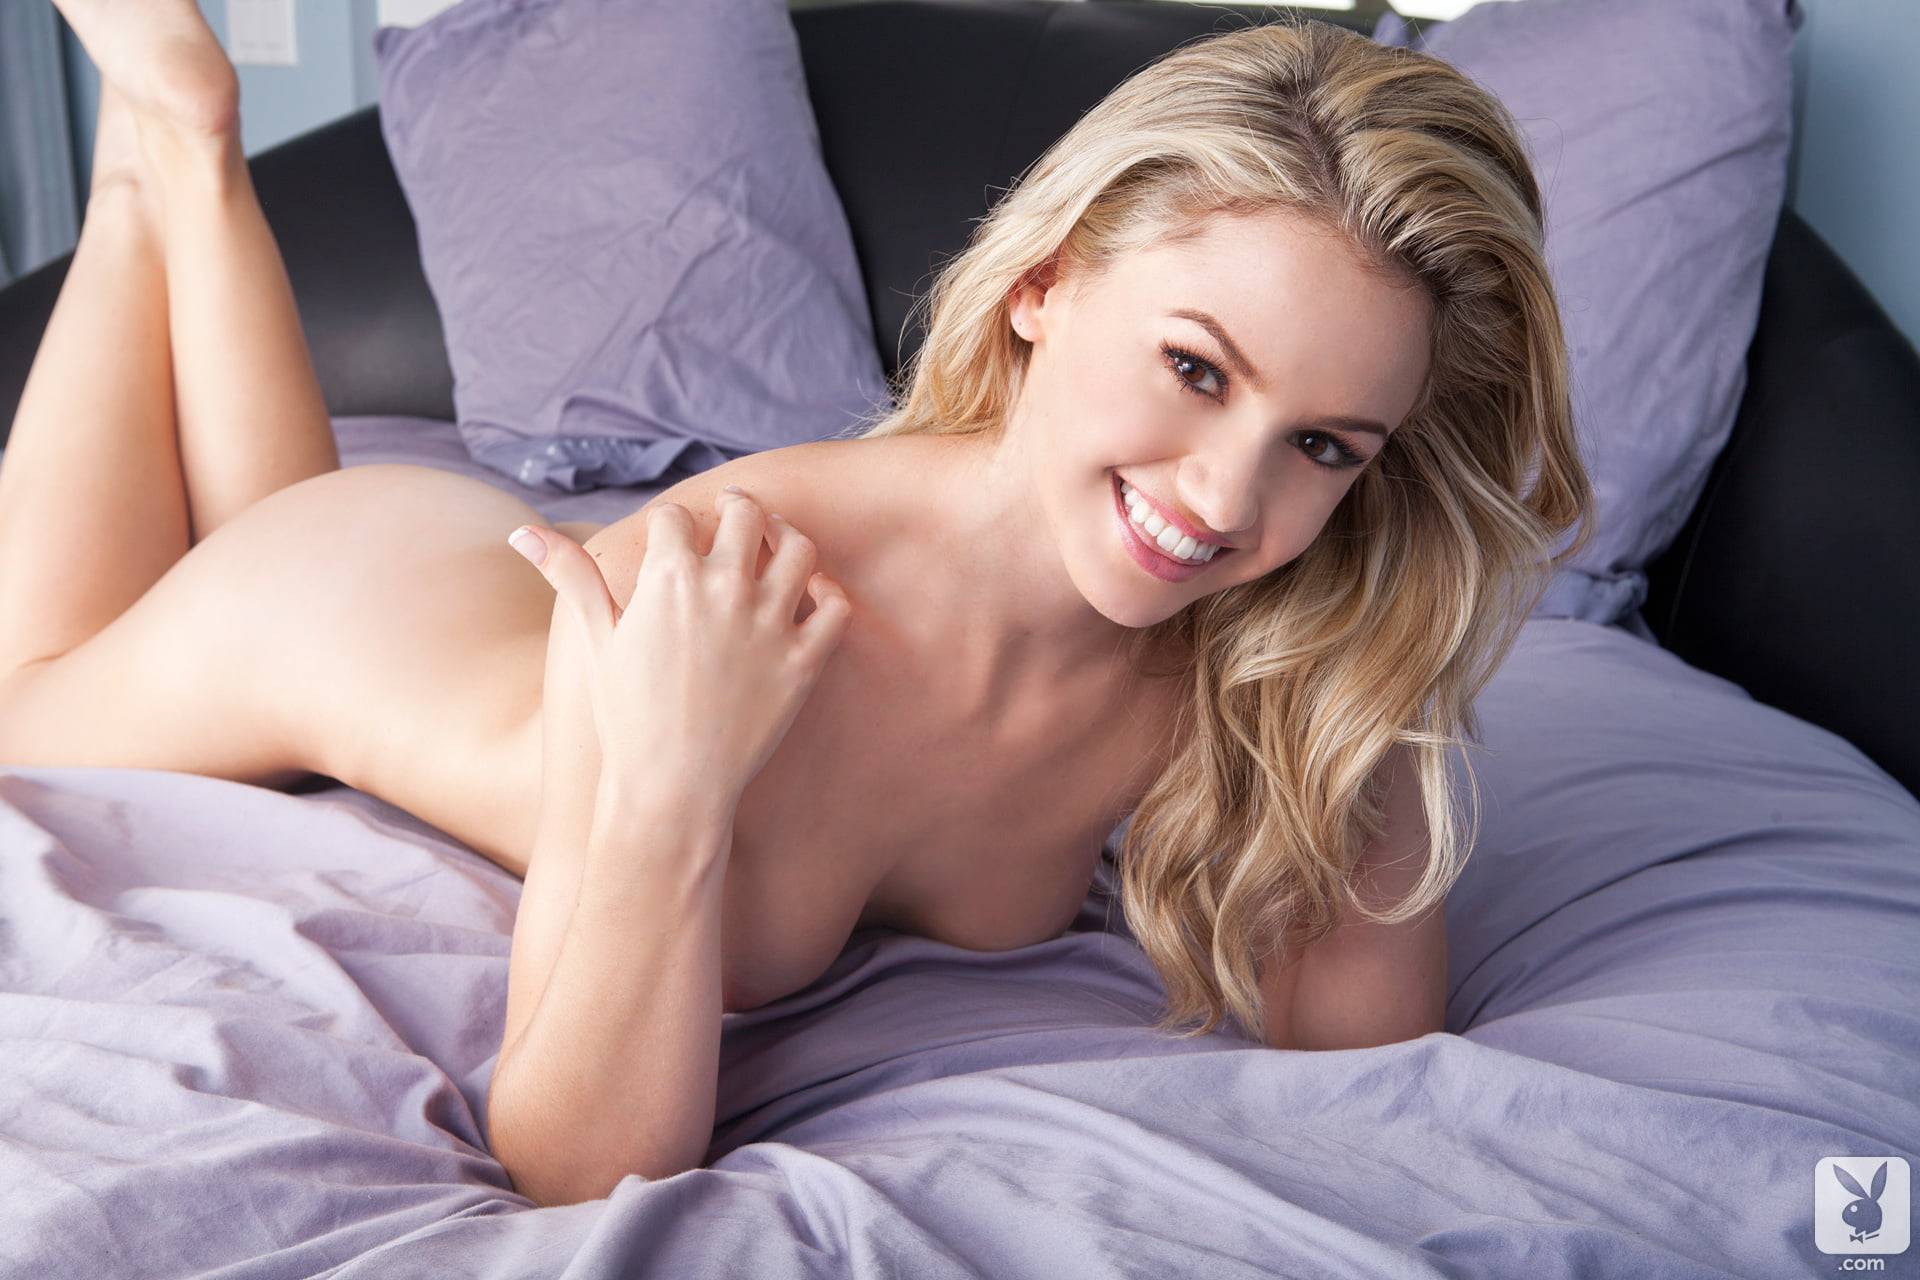 chloe-miranda-all-nude30